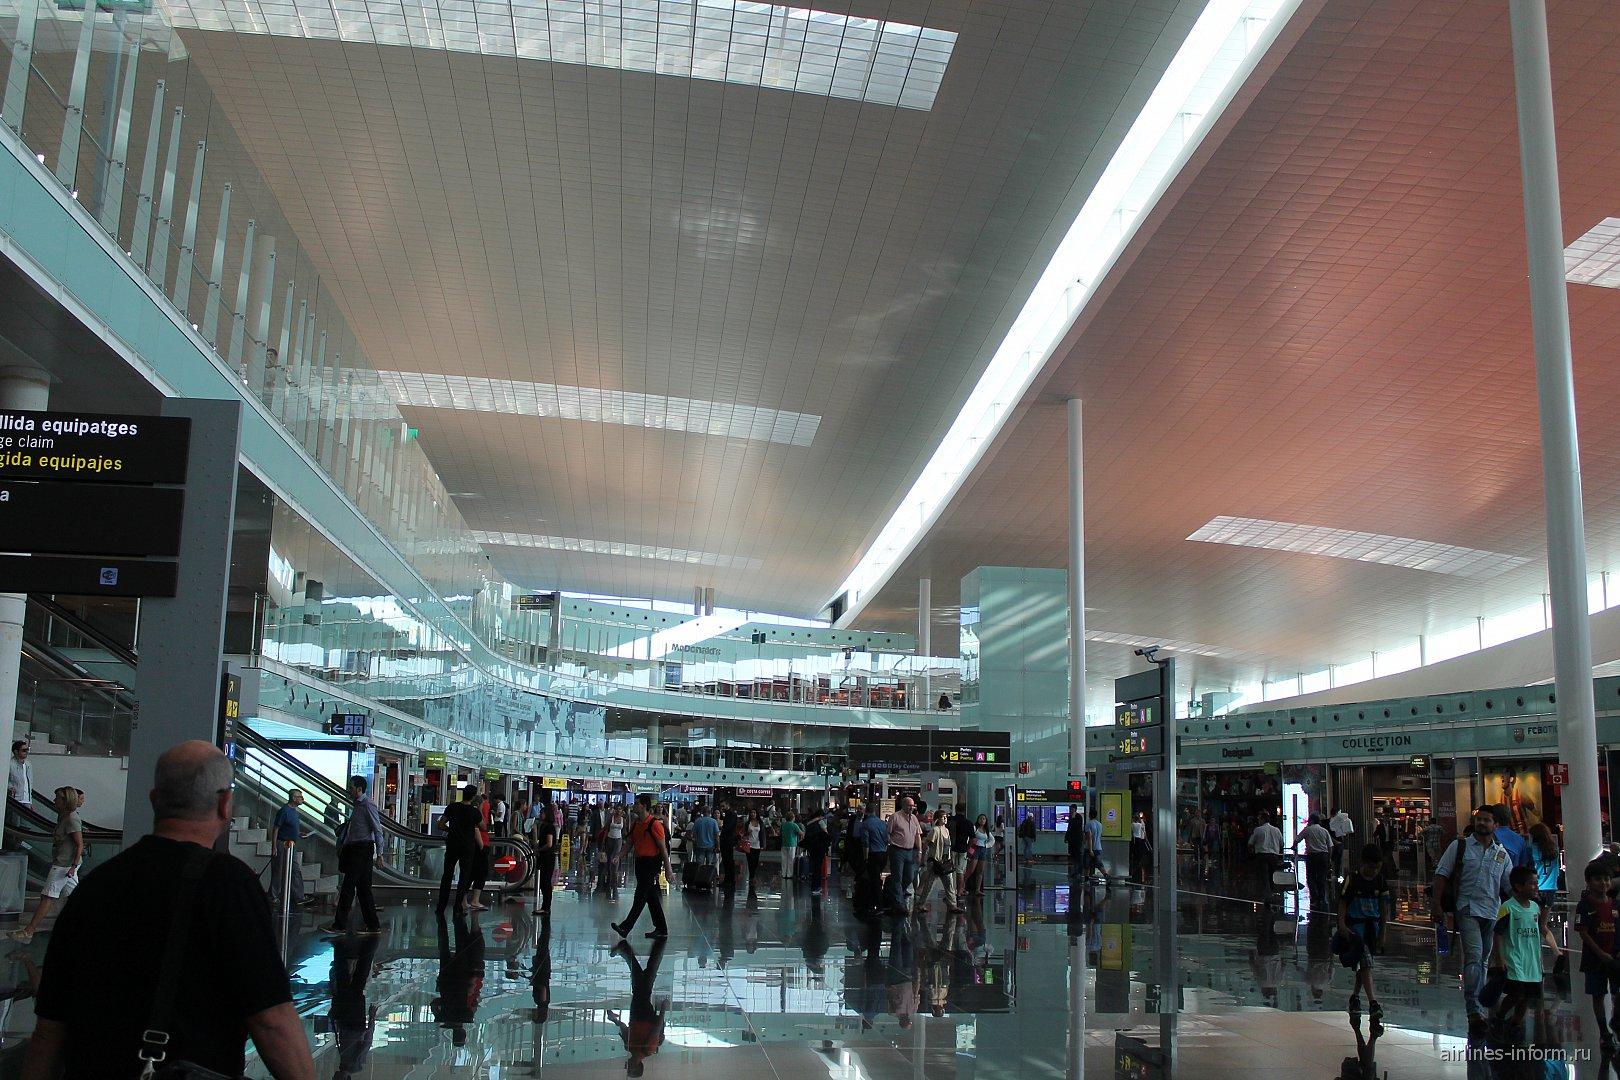 Чистая зона терминала Т1 аэропорта Барселоны